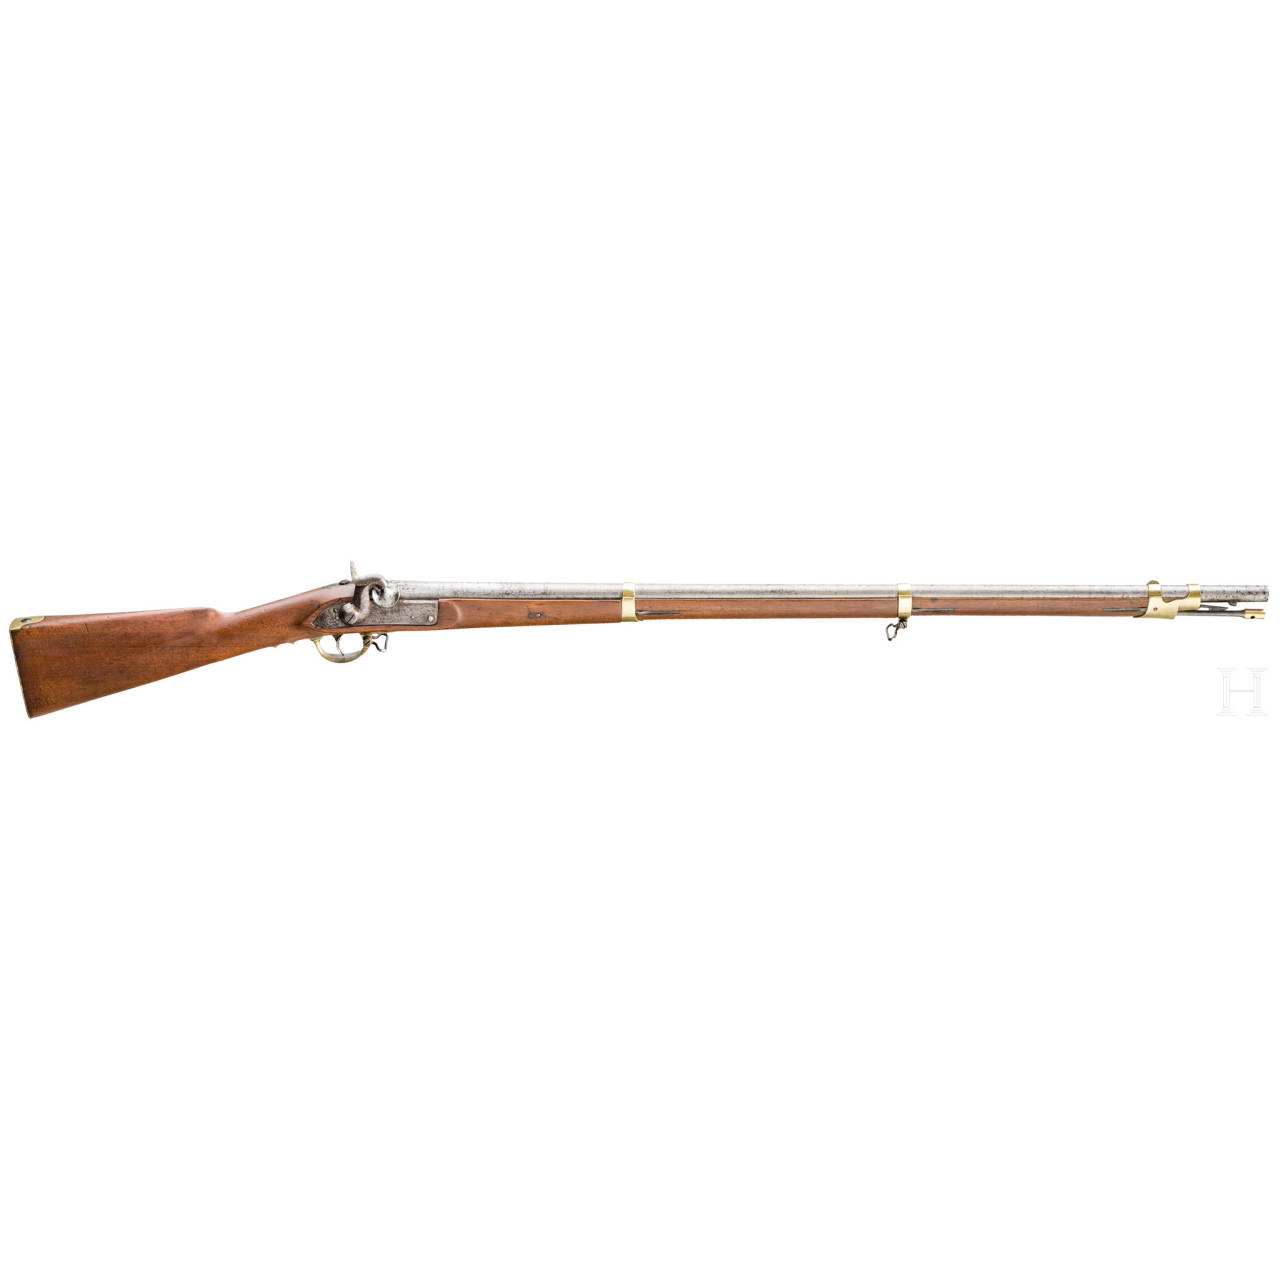 Kadettengewehr, um 1840